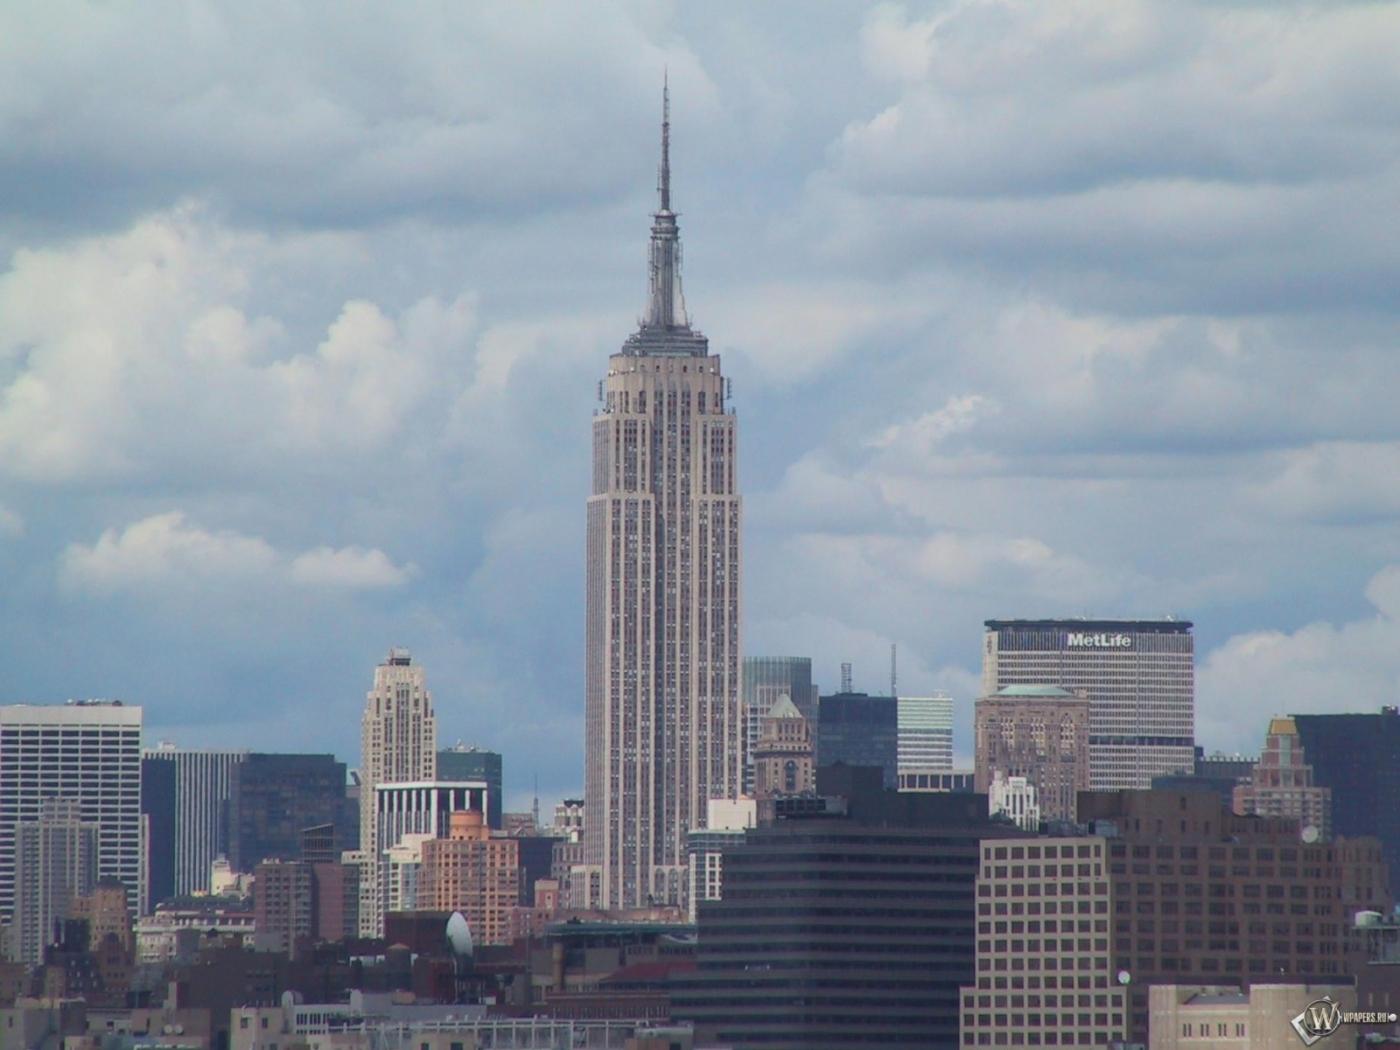 New york эмпайр стейт билдинг 1400x1050